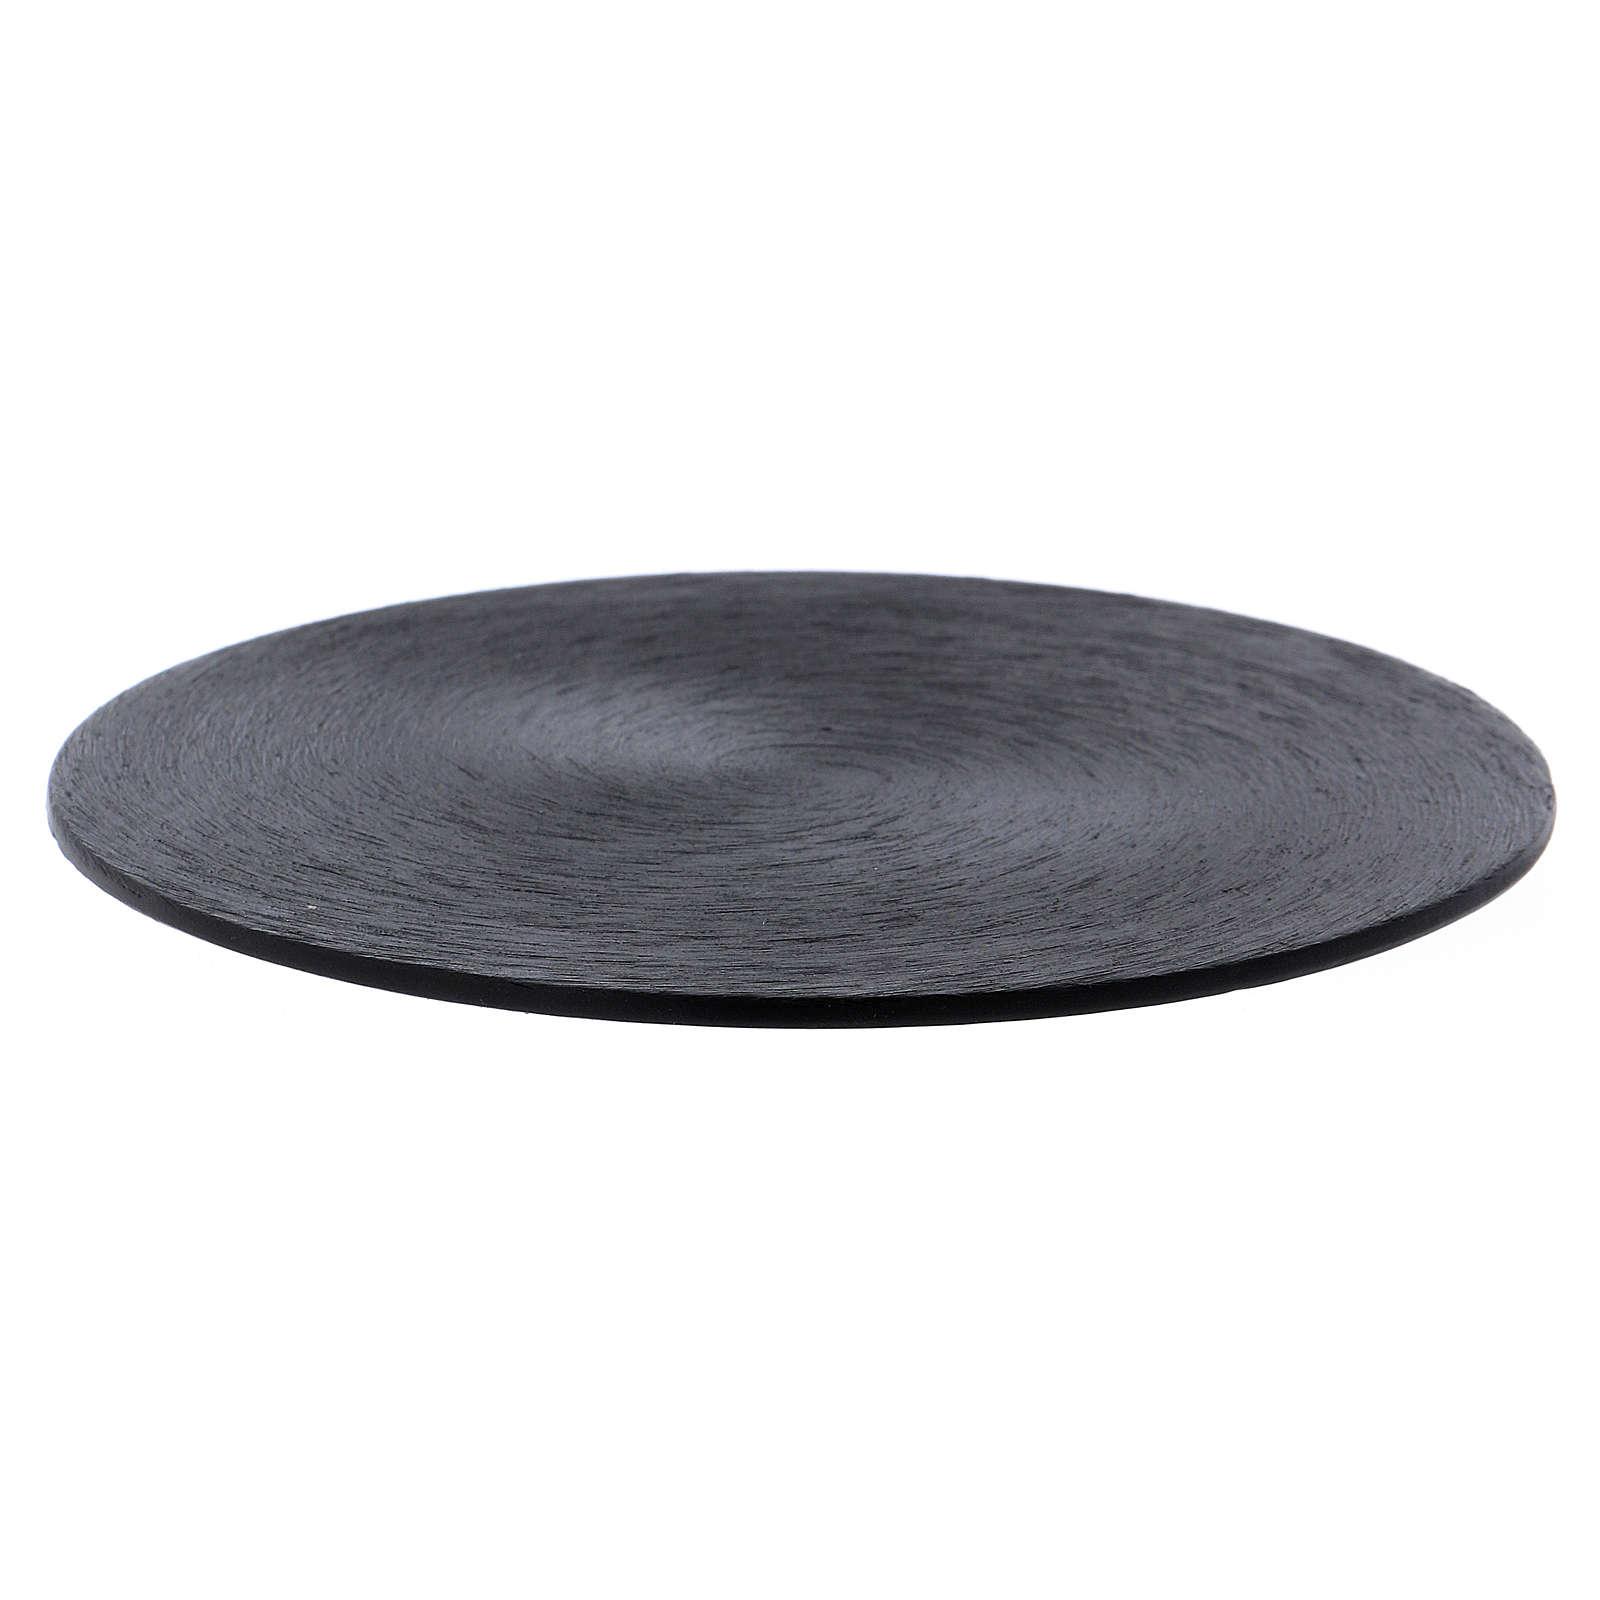 Candle holder plate in black aluminium 3